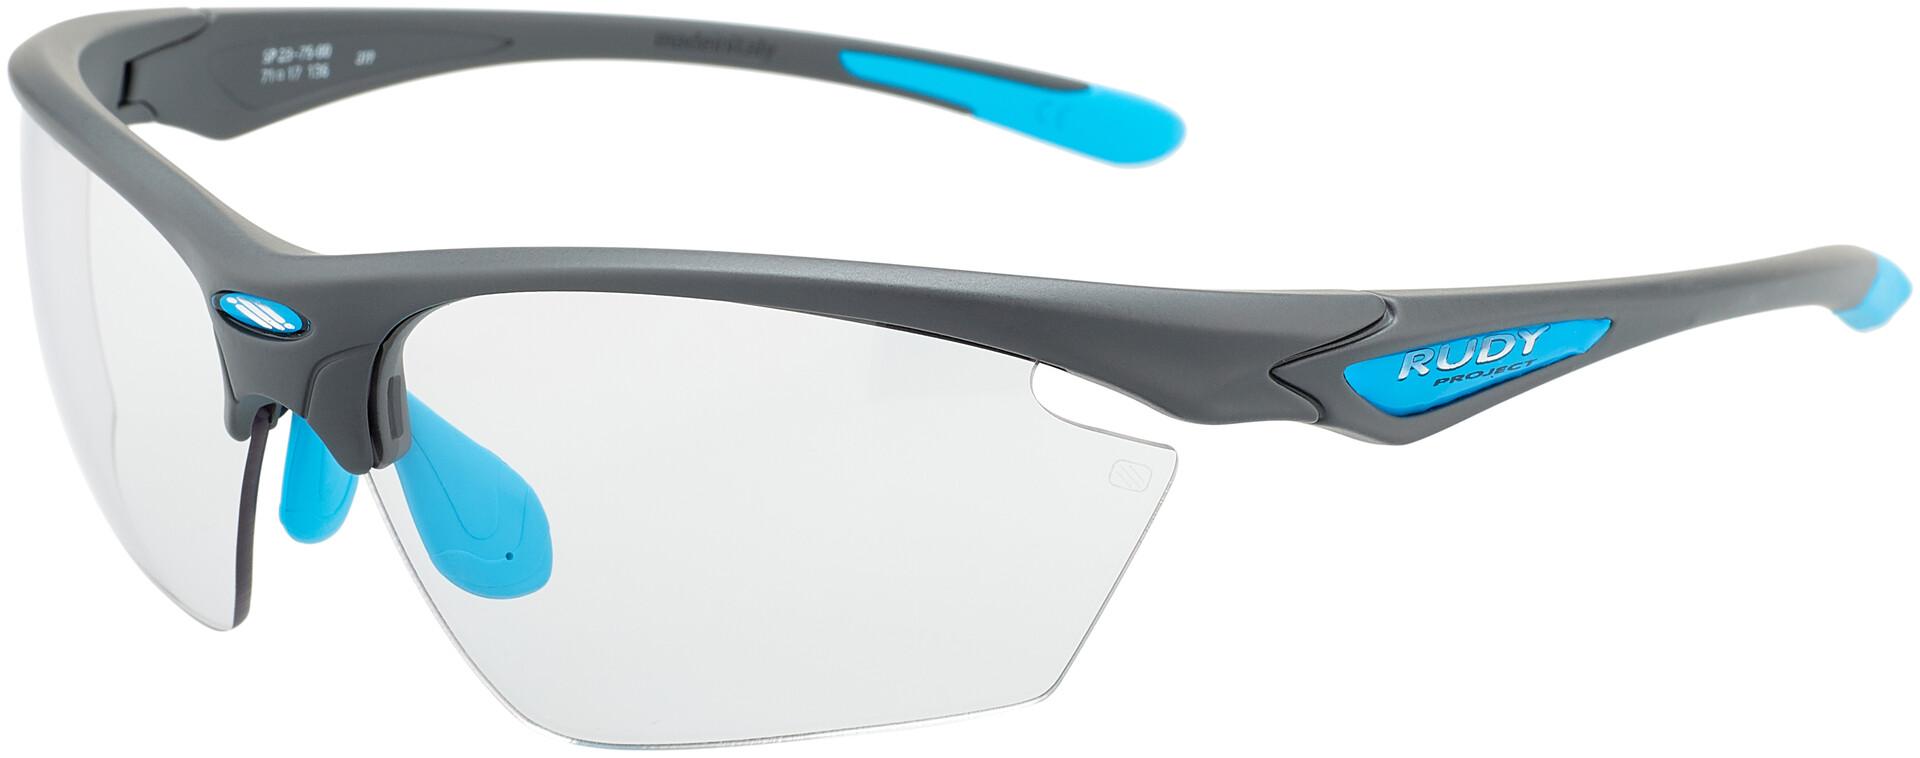 Rudy Project Stratofly Cykelbriller, pyombo matte impactx photochromic 2 black